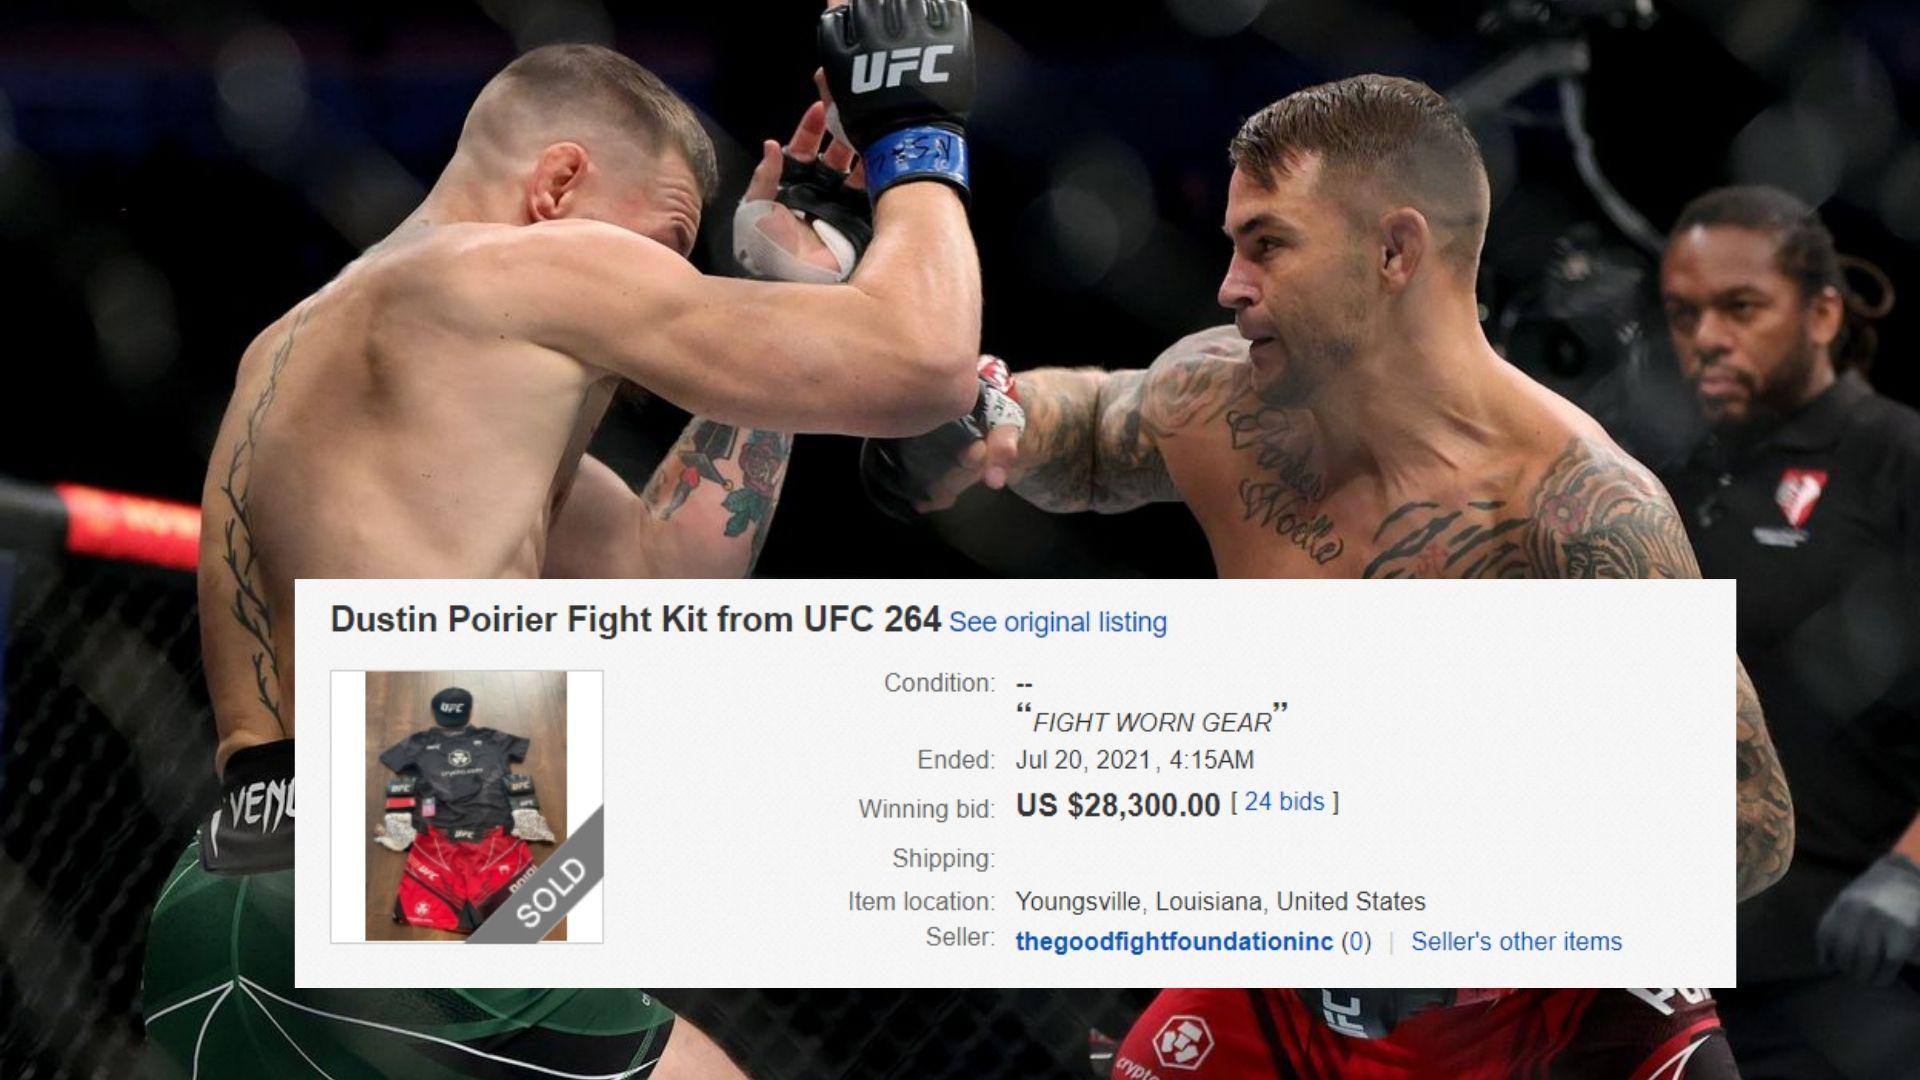 Dustin Poirier fight kit UFC 264